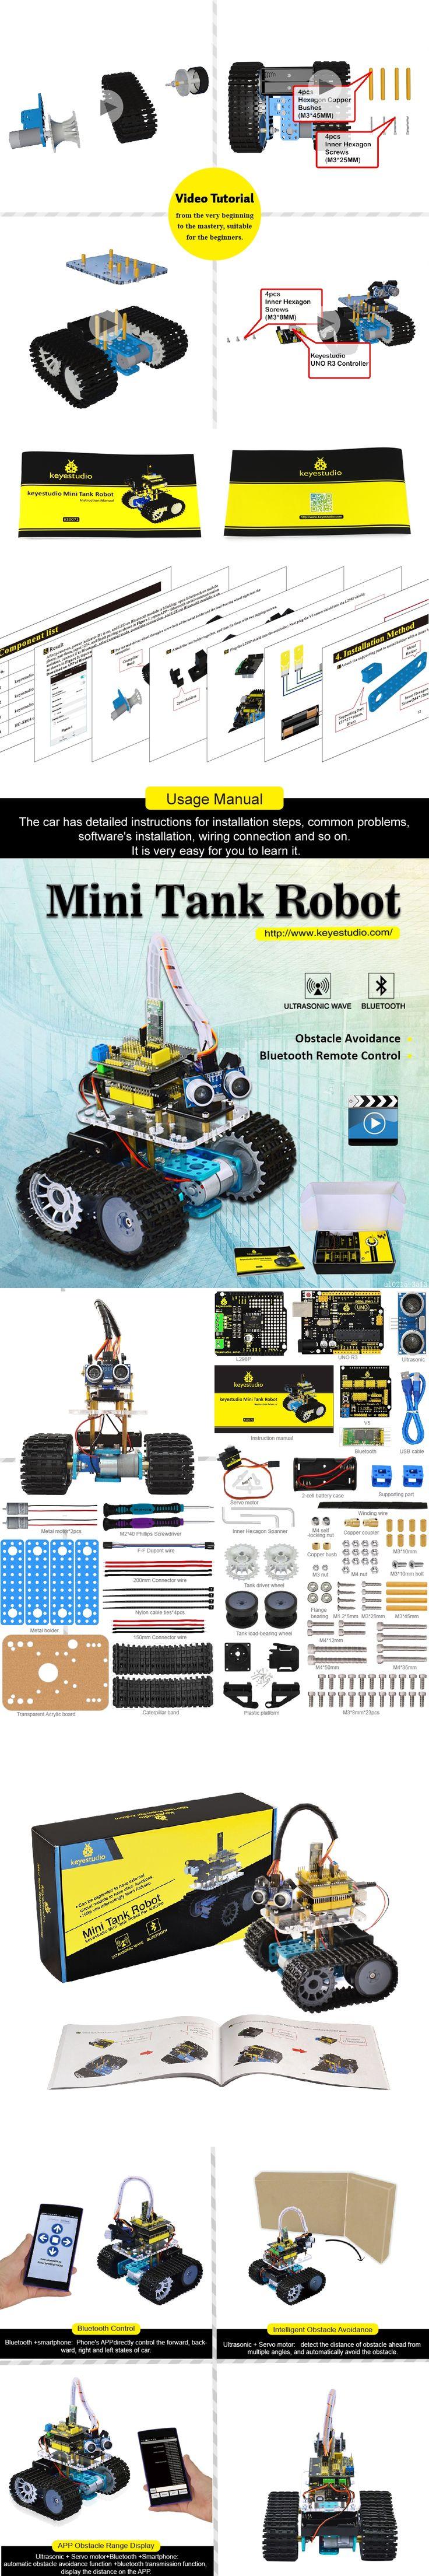 Keyestudio DIY Mini Tank Smart Robot  car kit for arduino Robot starter + manual+PDF+ Installation Video+Demo Video+5 Projects